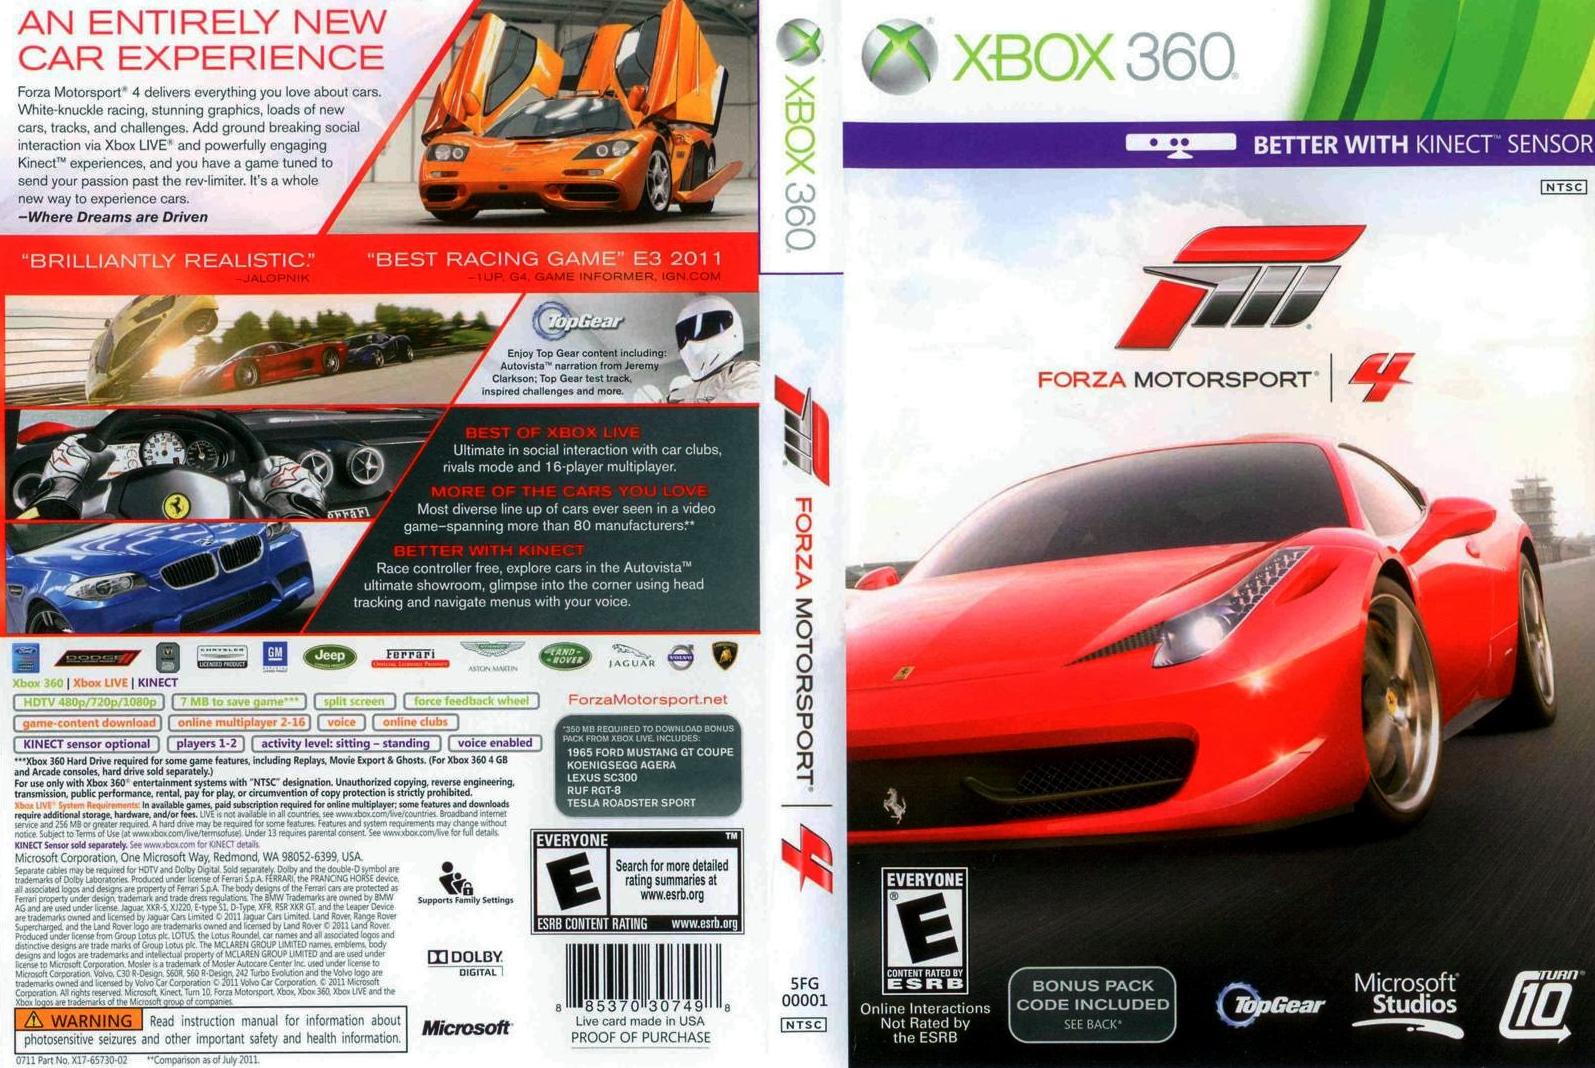 jogos rgh xbox 360 download torrent